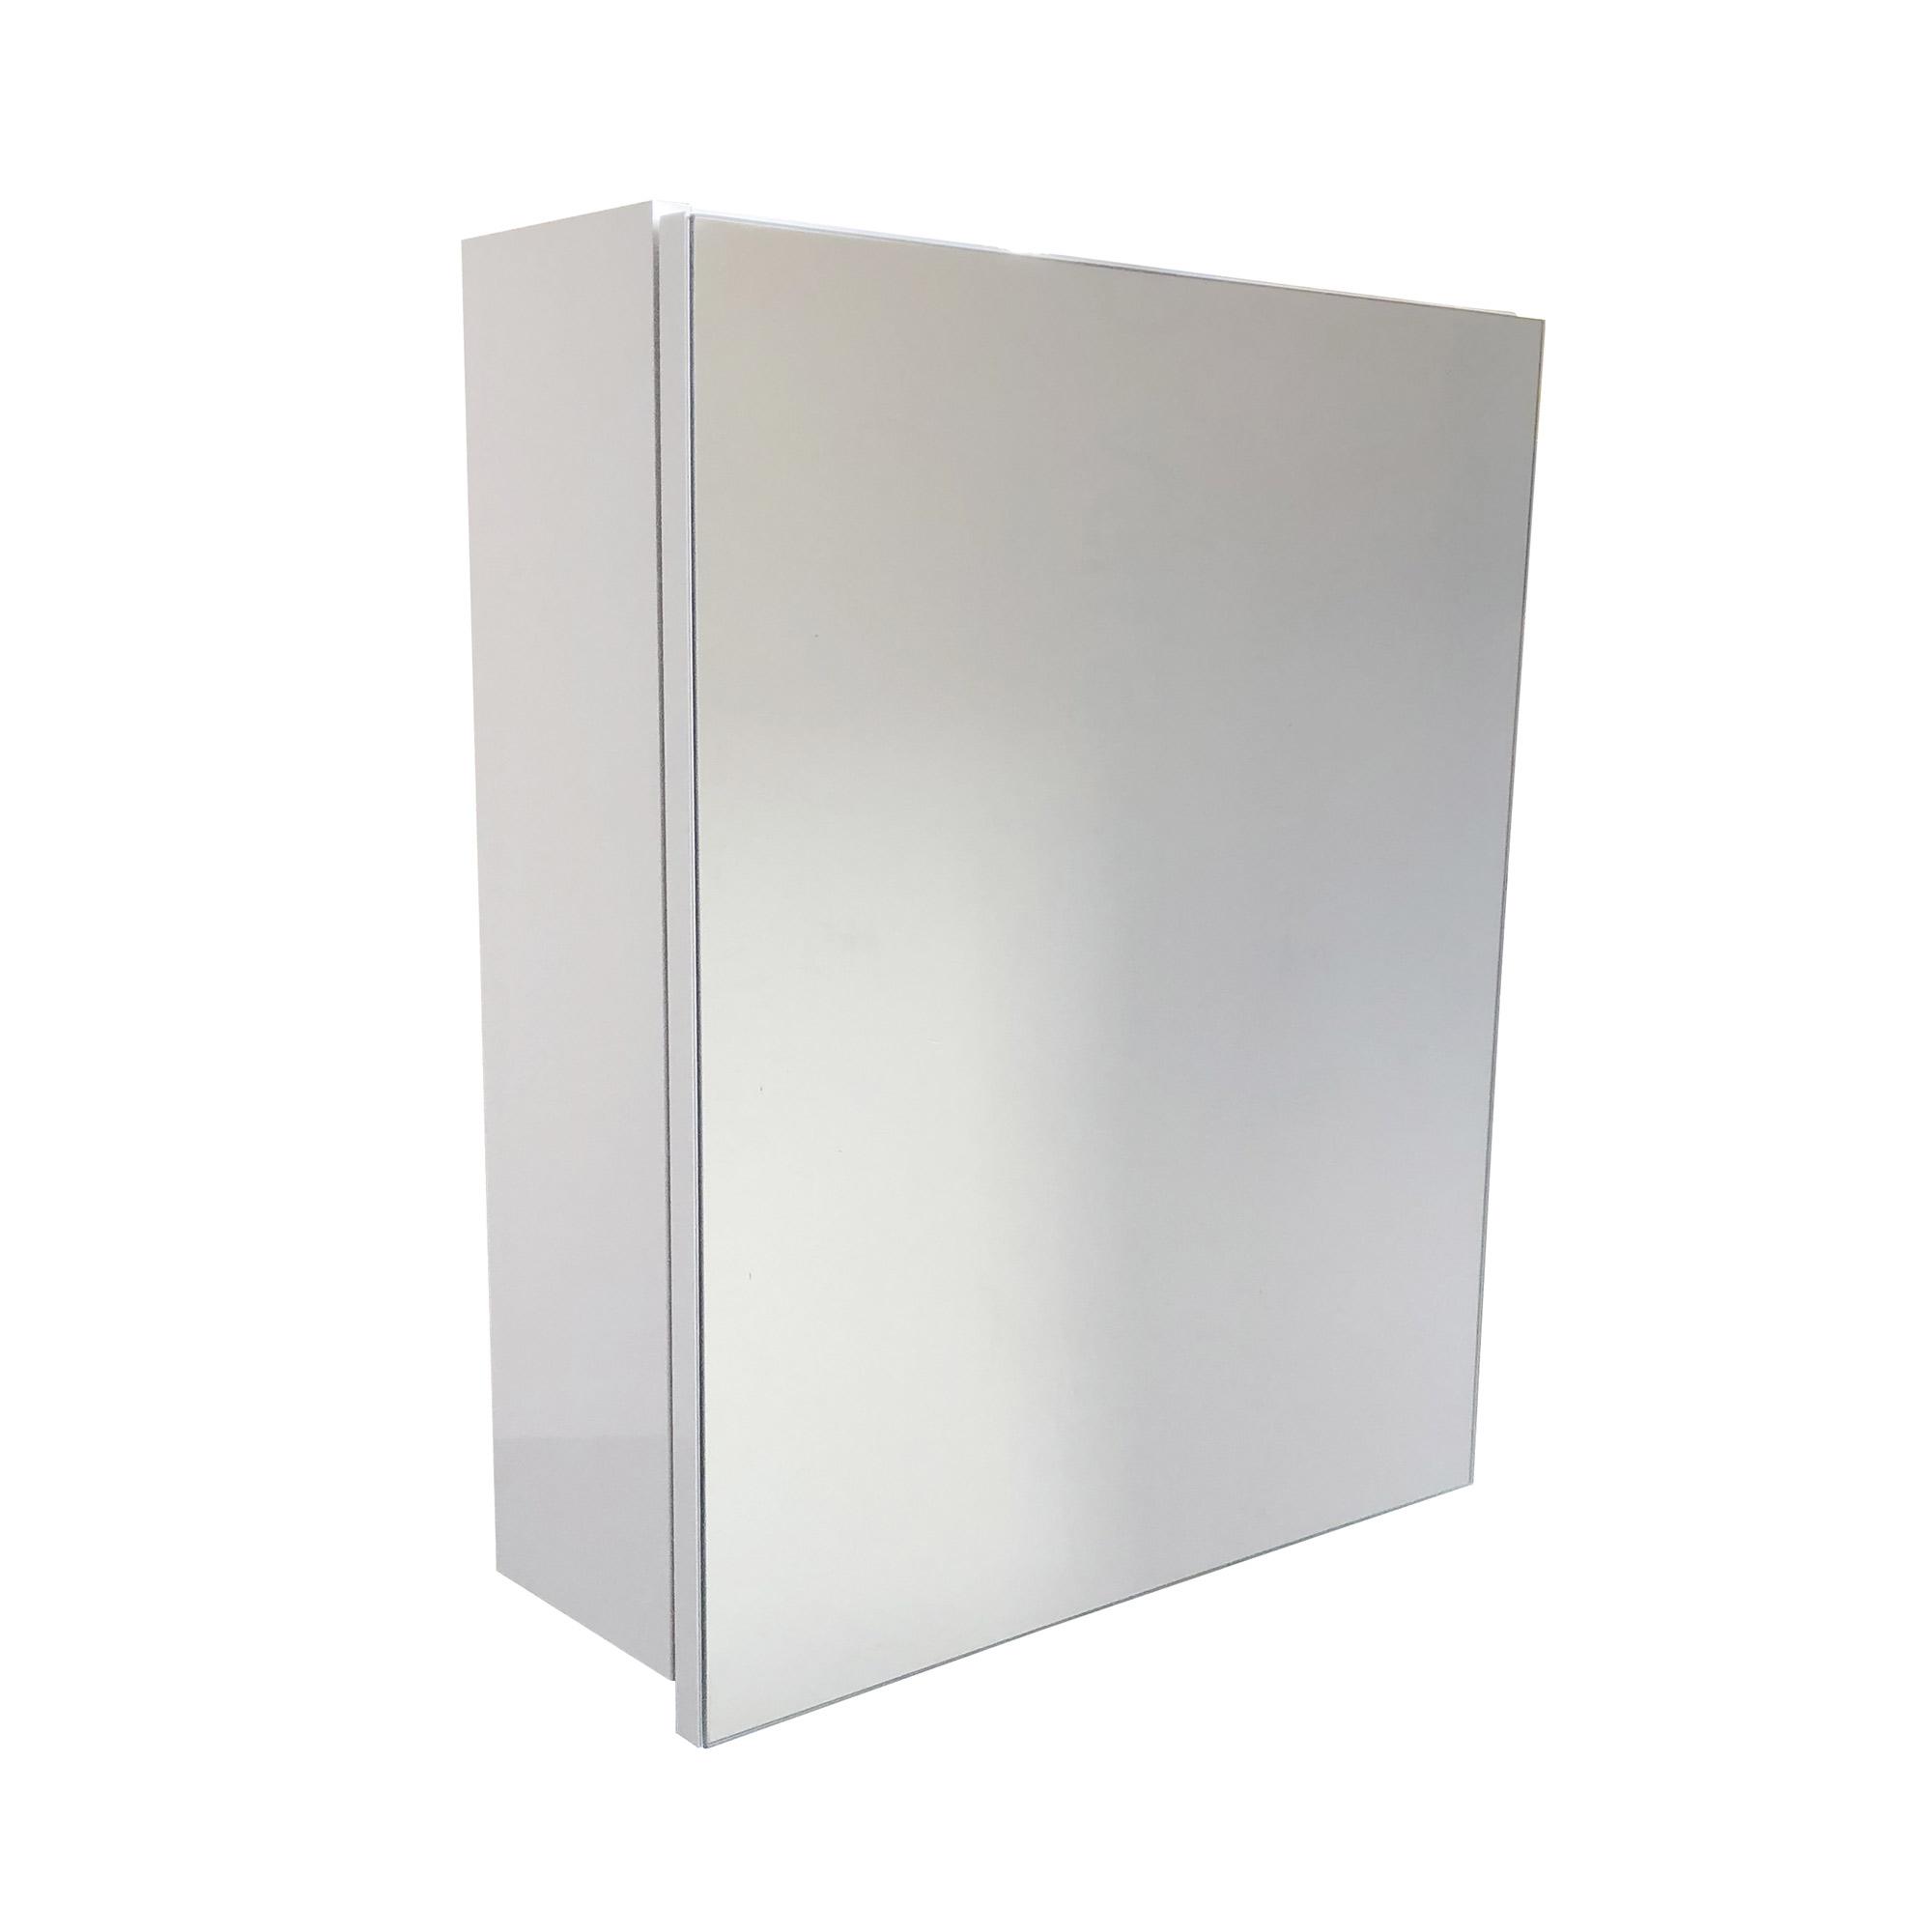 Spegelskåp Demerx Skagerack 50